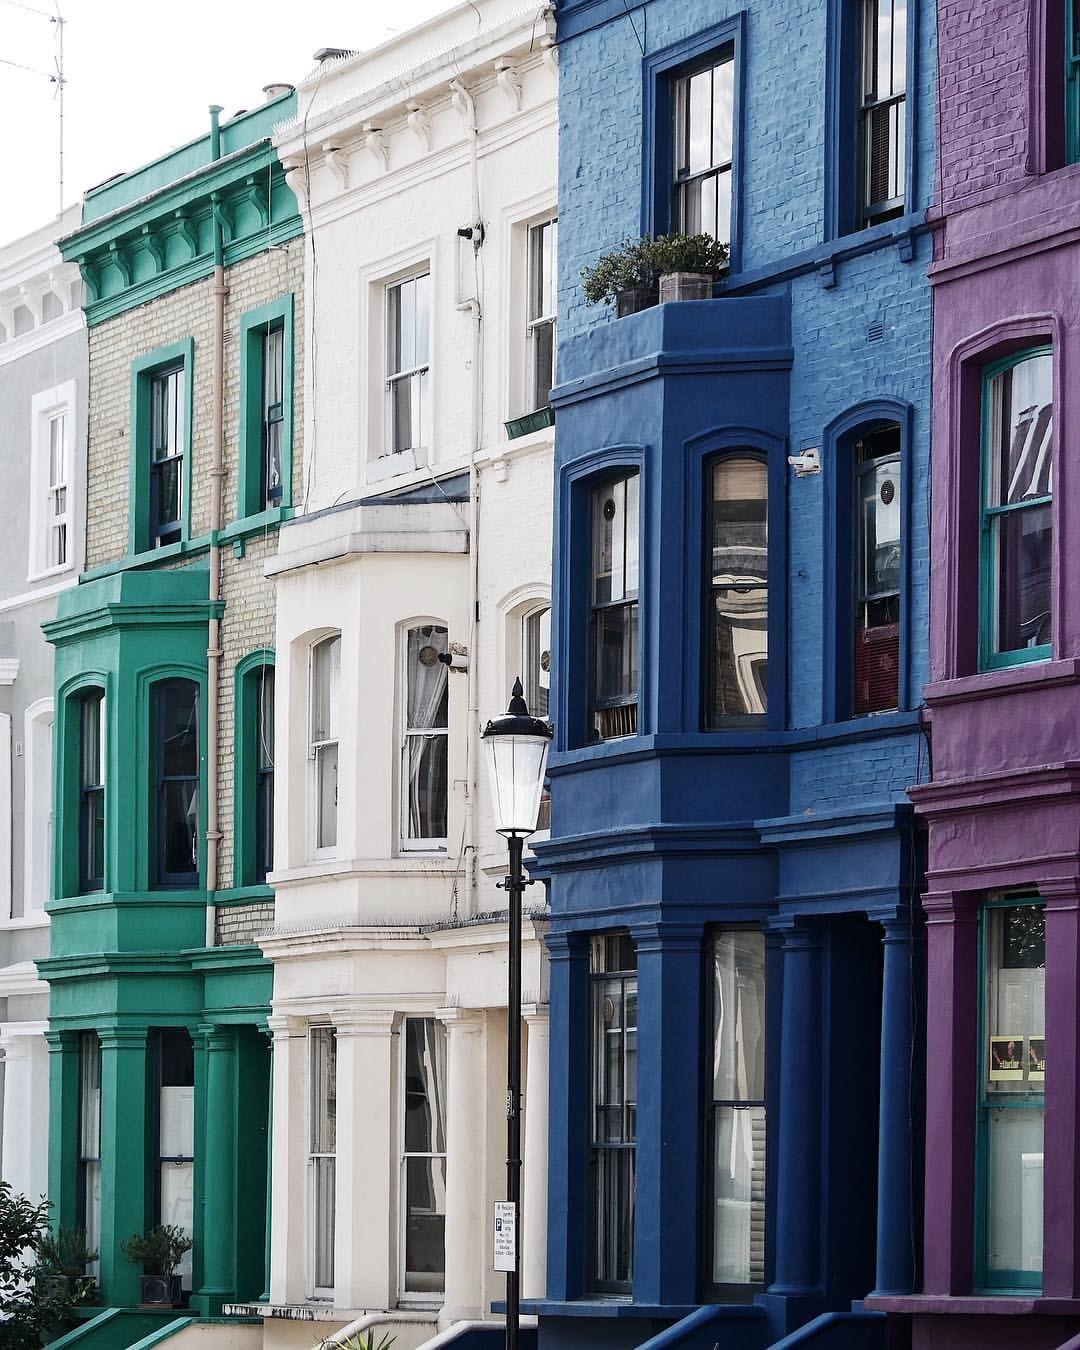 Notting Hill London: Notting Hill London, London